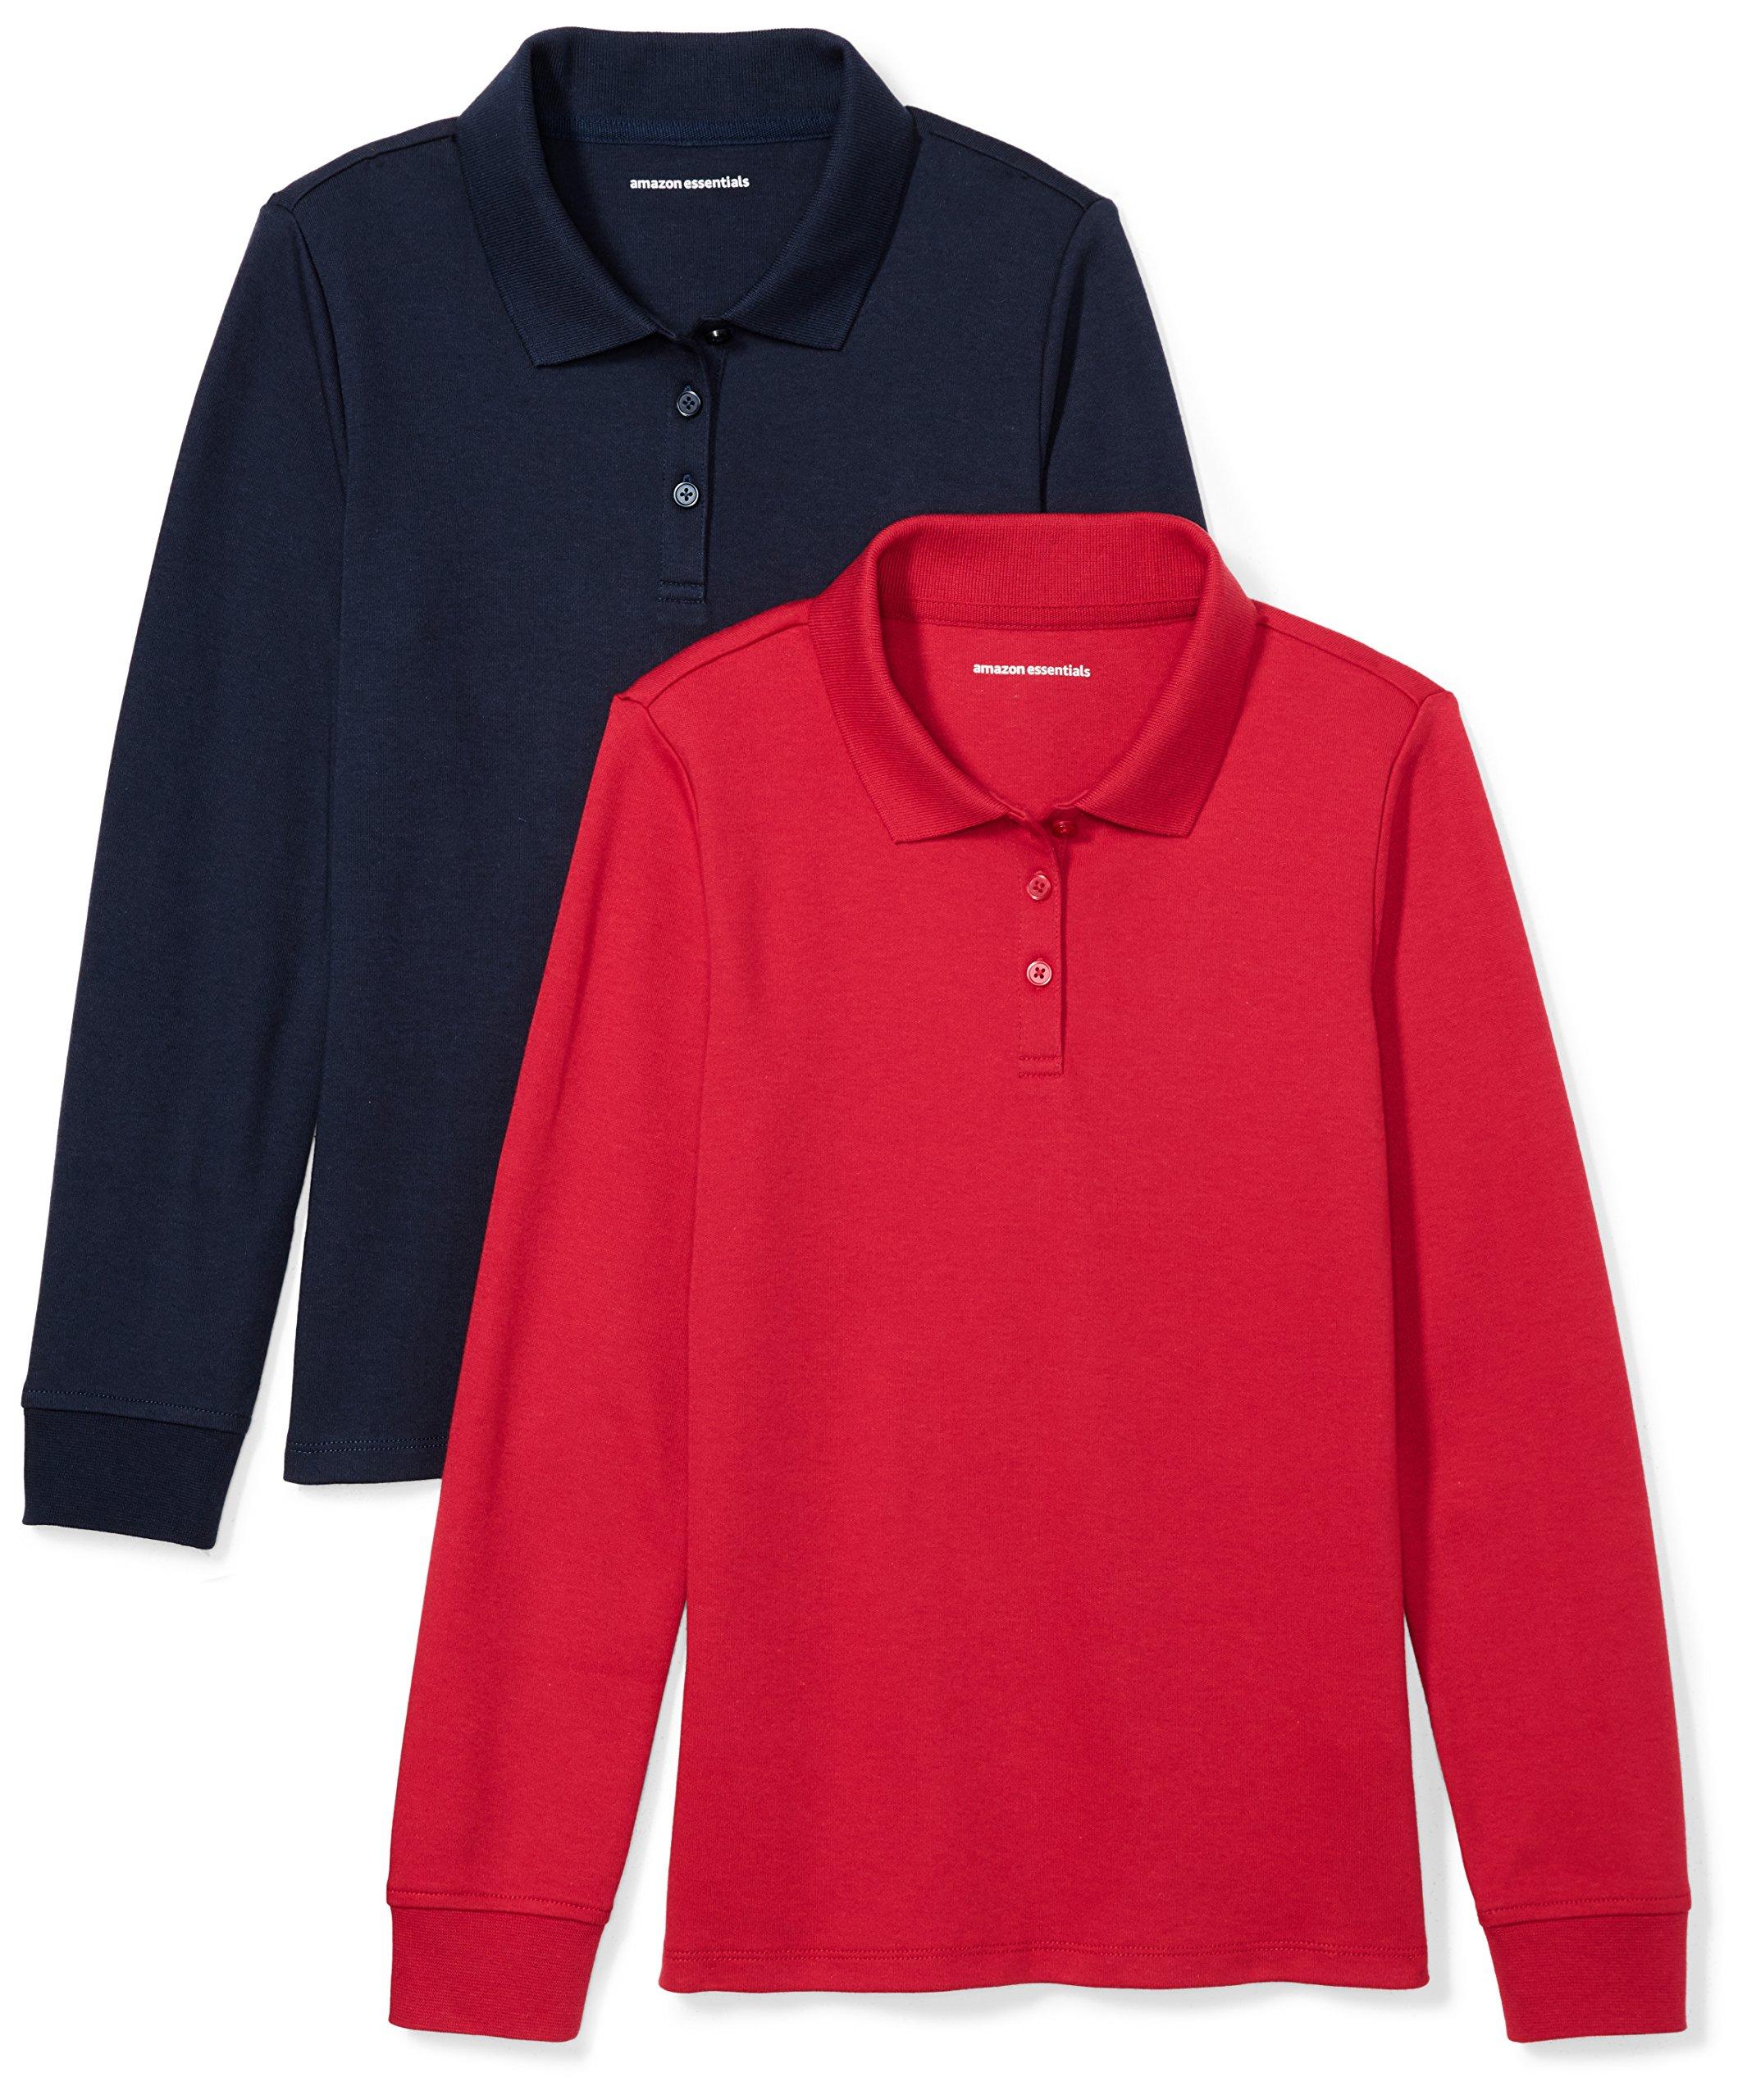 0fc67fd80 Amazon Essentials Girls' 2-Pack Long-Sleeve Interlock Polo Shirt product  image